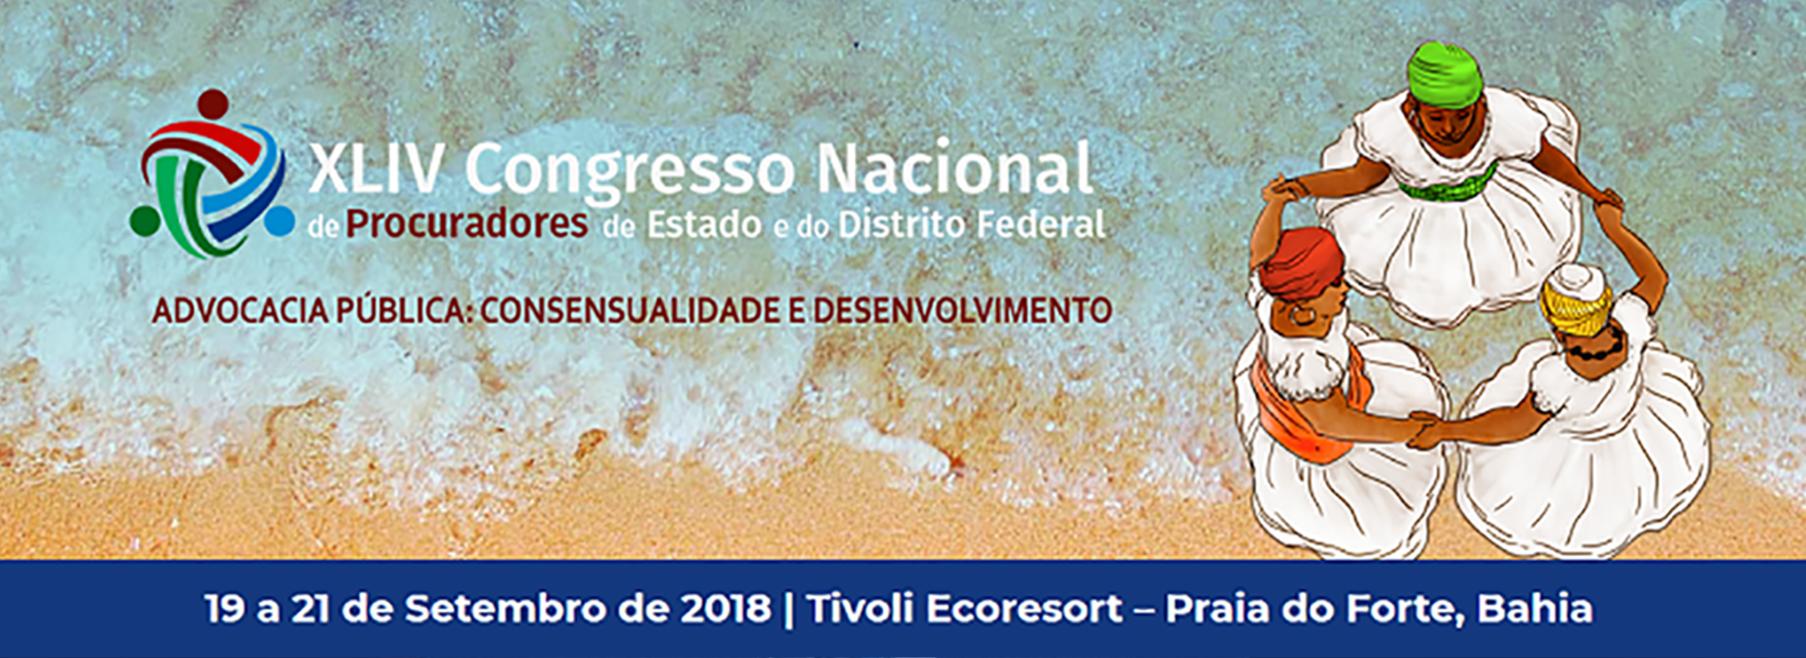 Membros participam de congresso nacional na Bahia